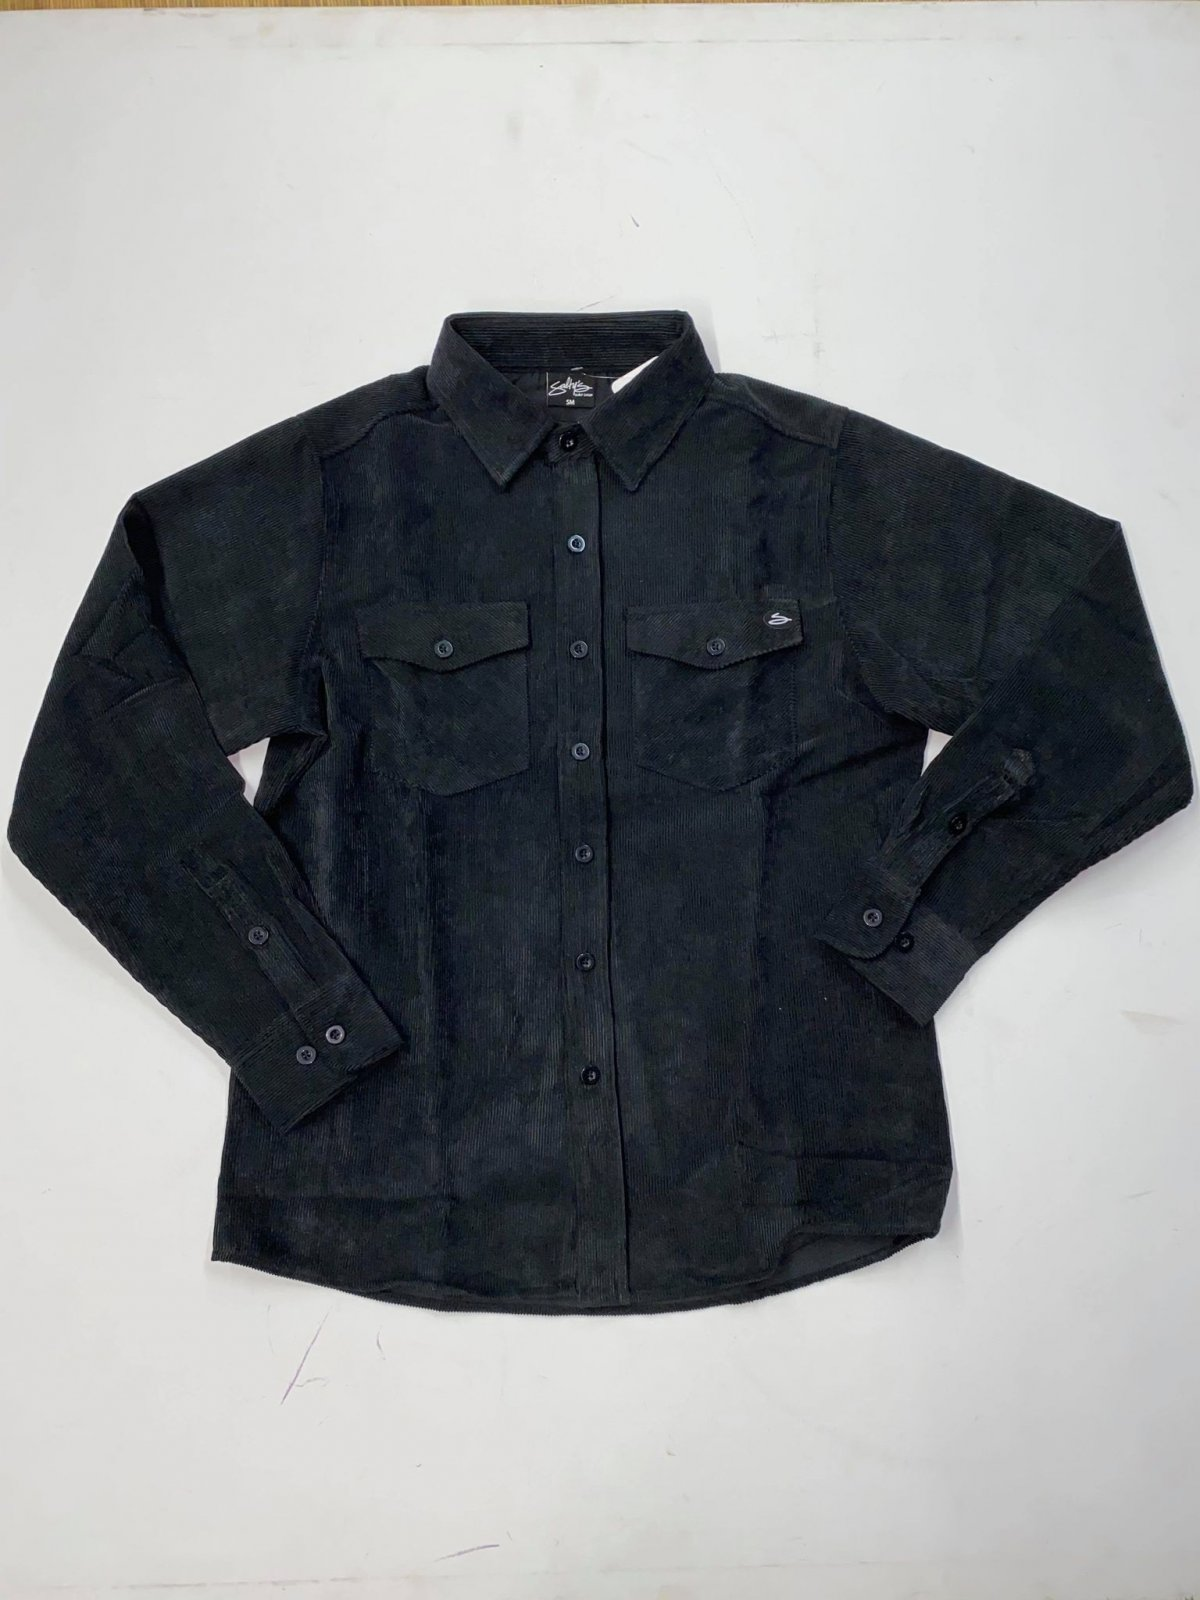 Salty's Brand Men's Corduroy Button Down Shirt - Black